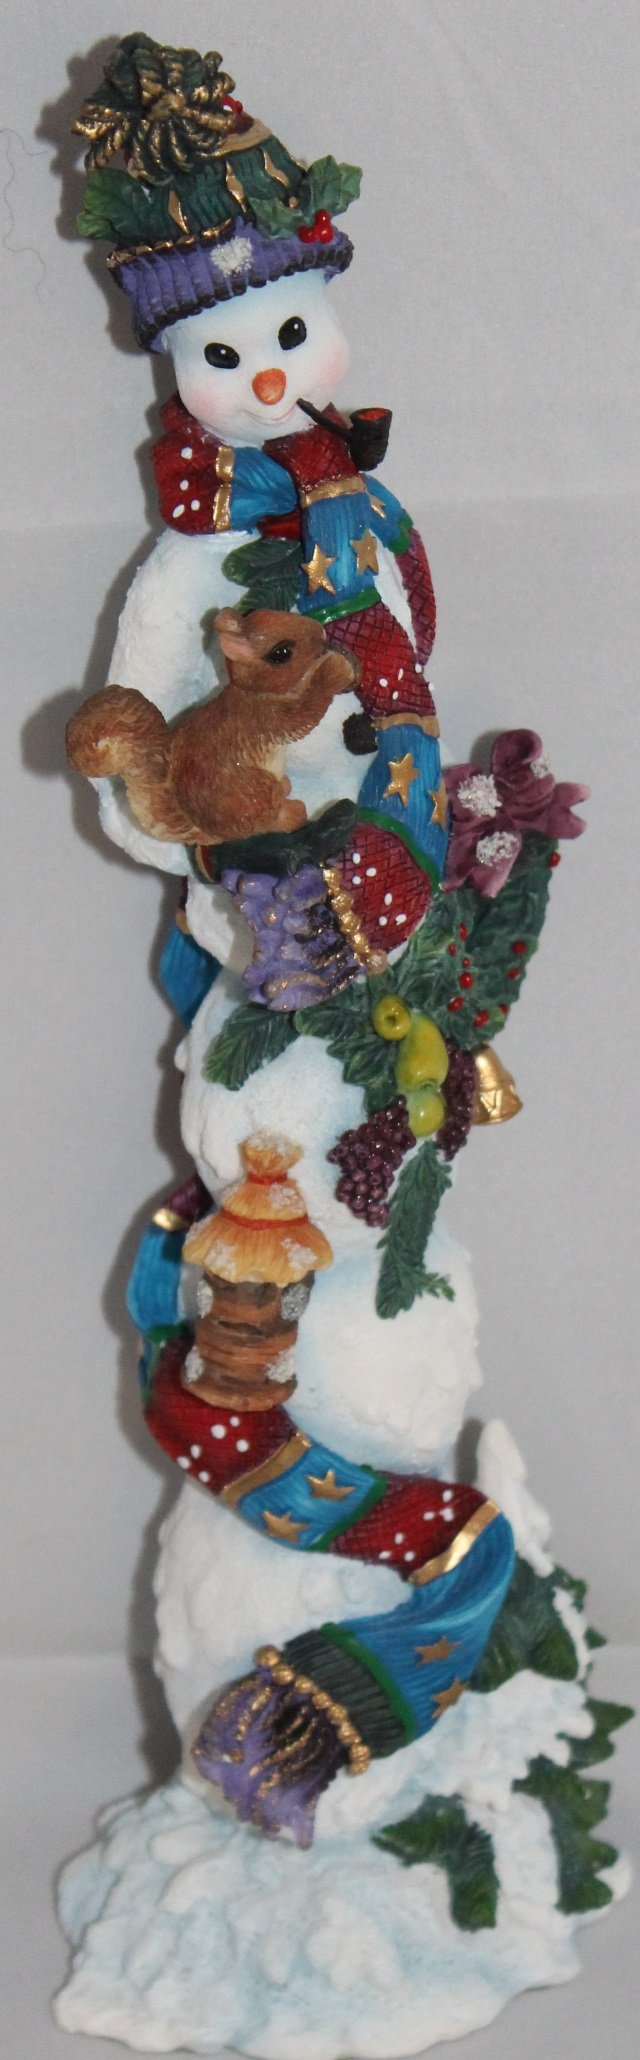 c430f325958b Cheap Pencil Snowman, find Pencil Snowman deals on line at Alibaba.com